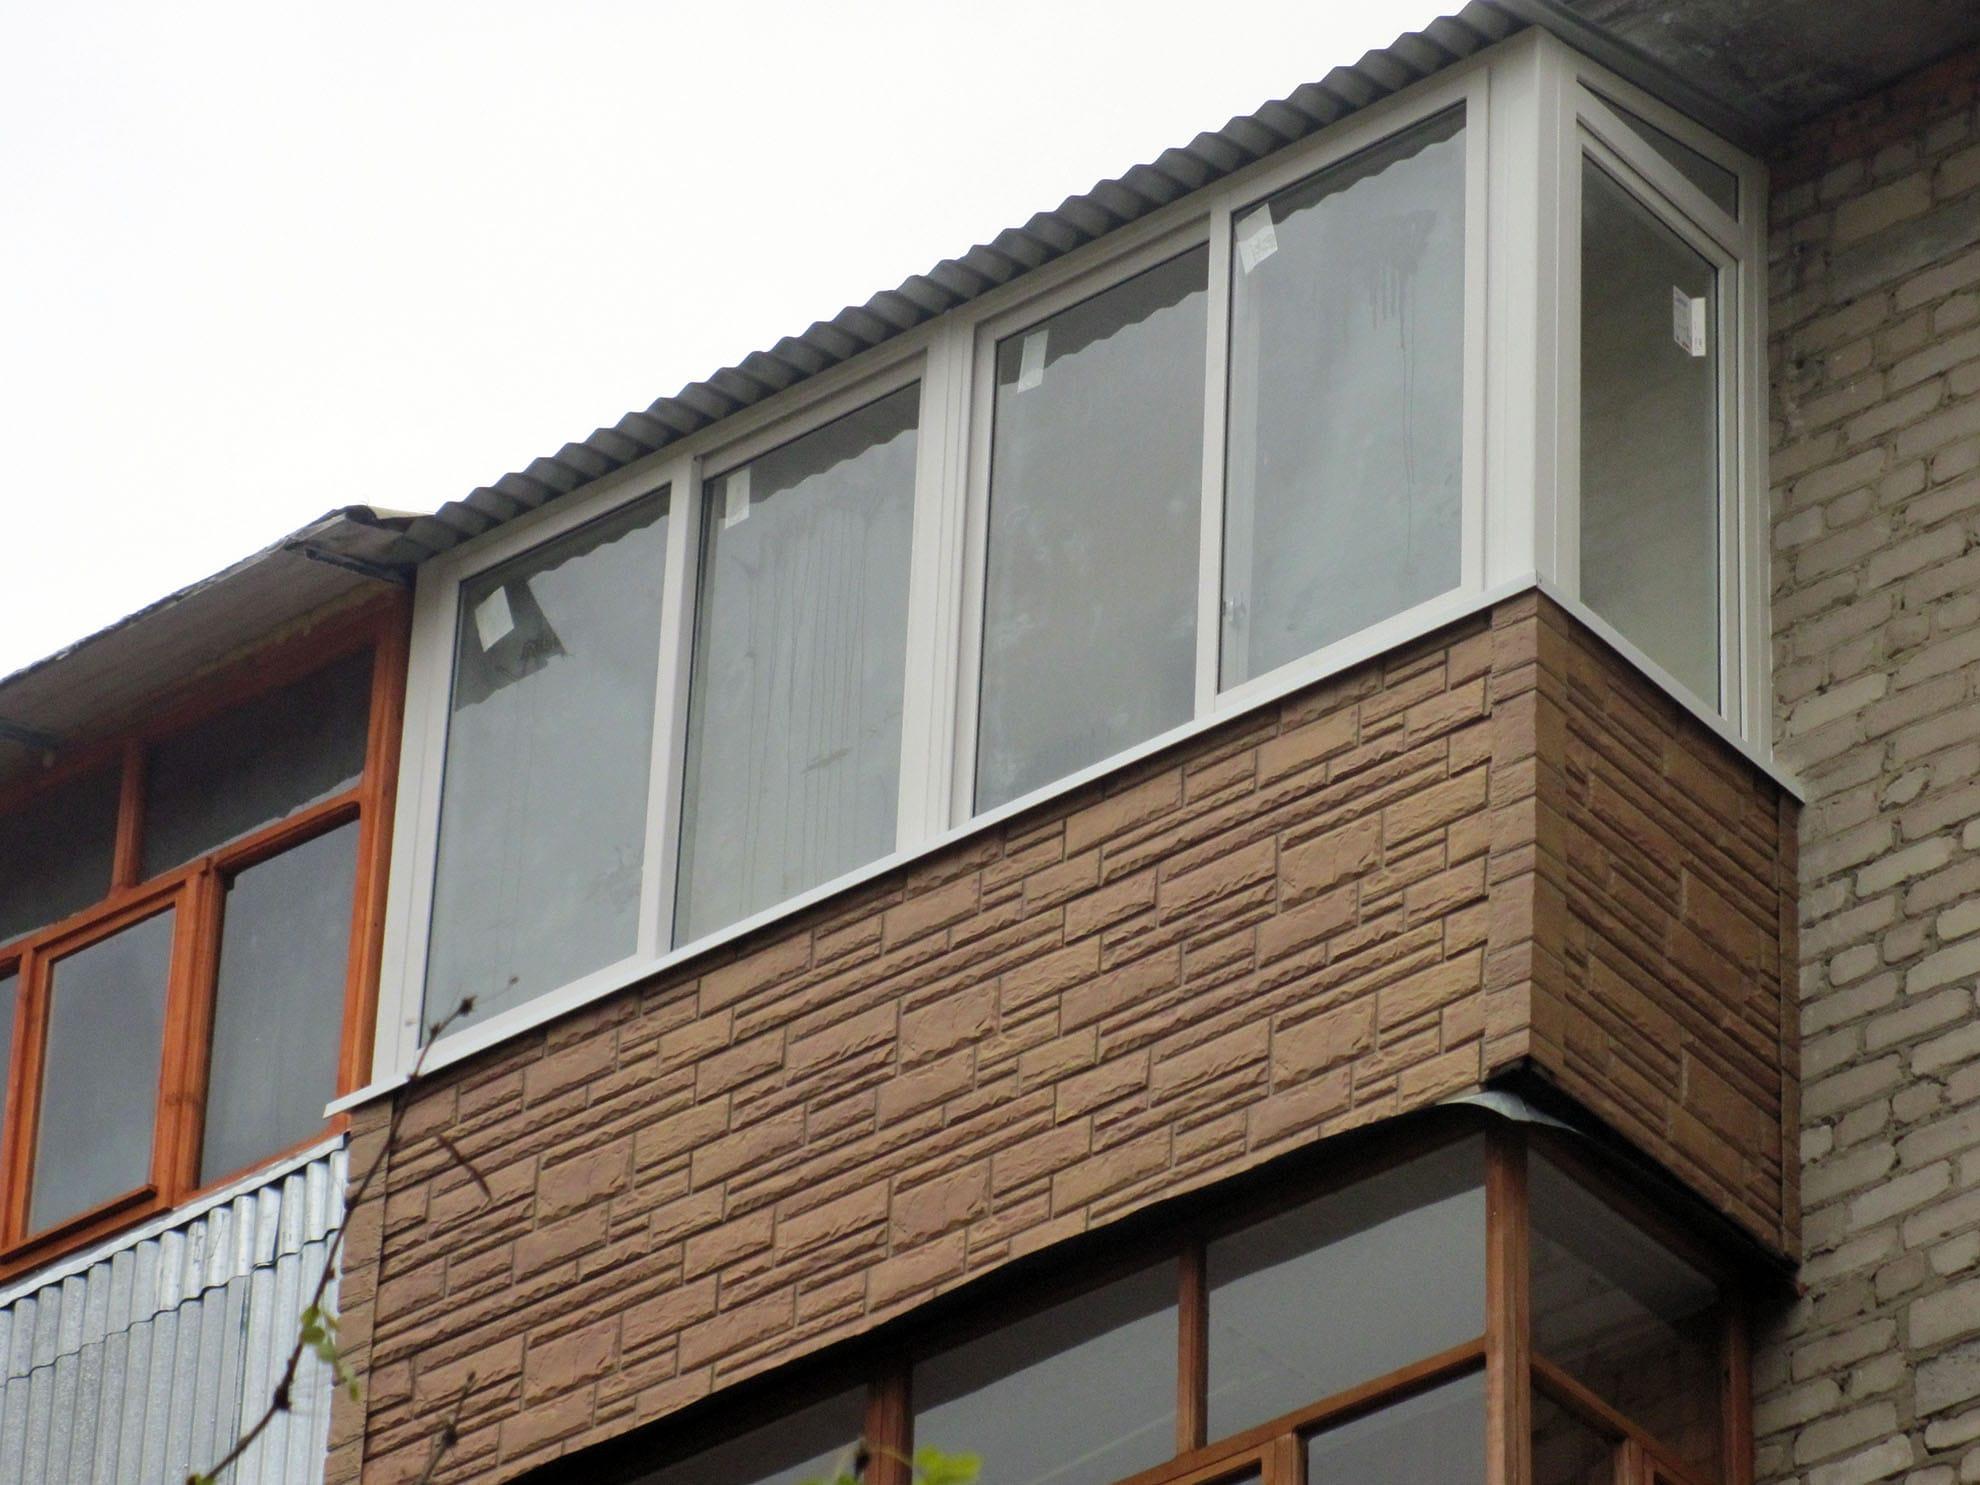 Отделка балкона сайдингом, имитирующим камень